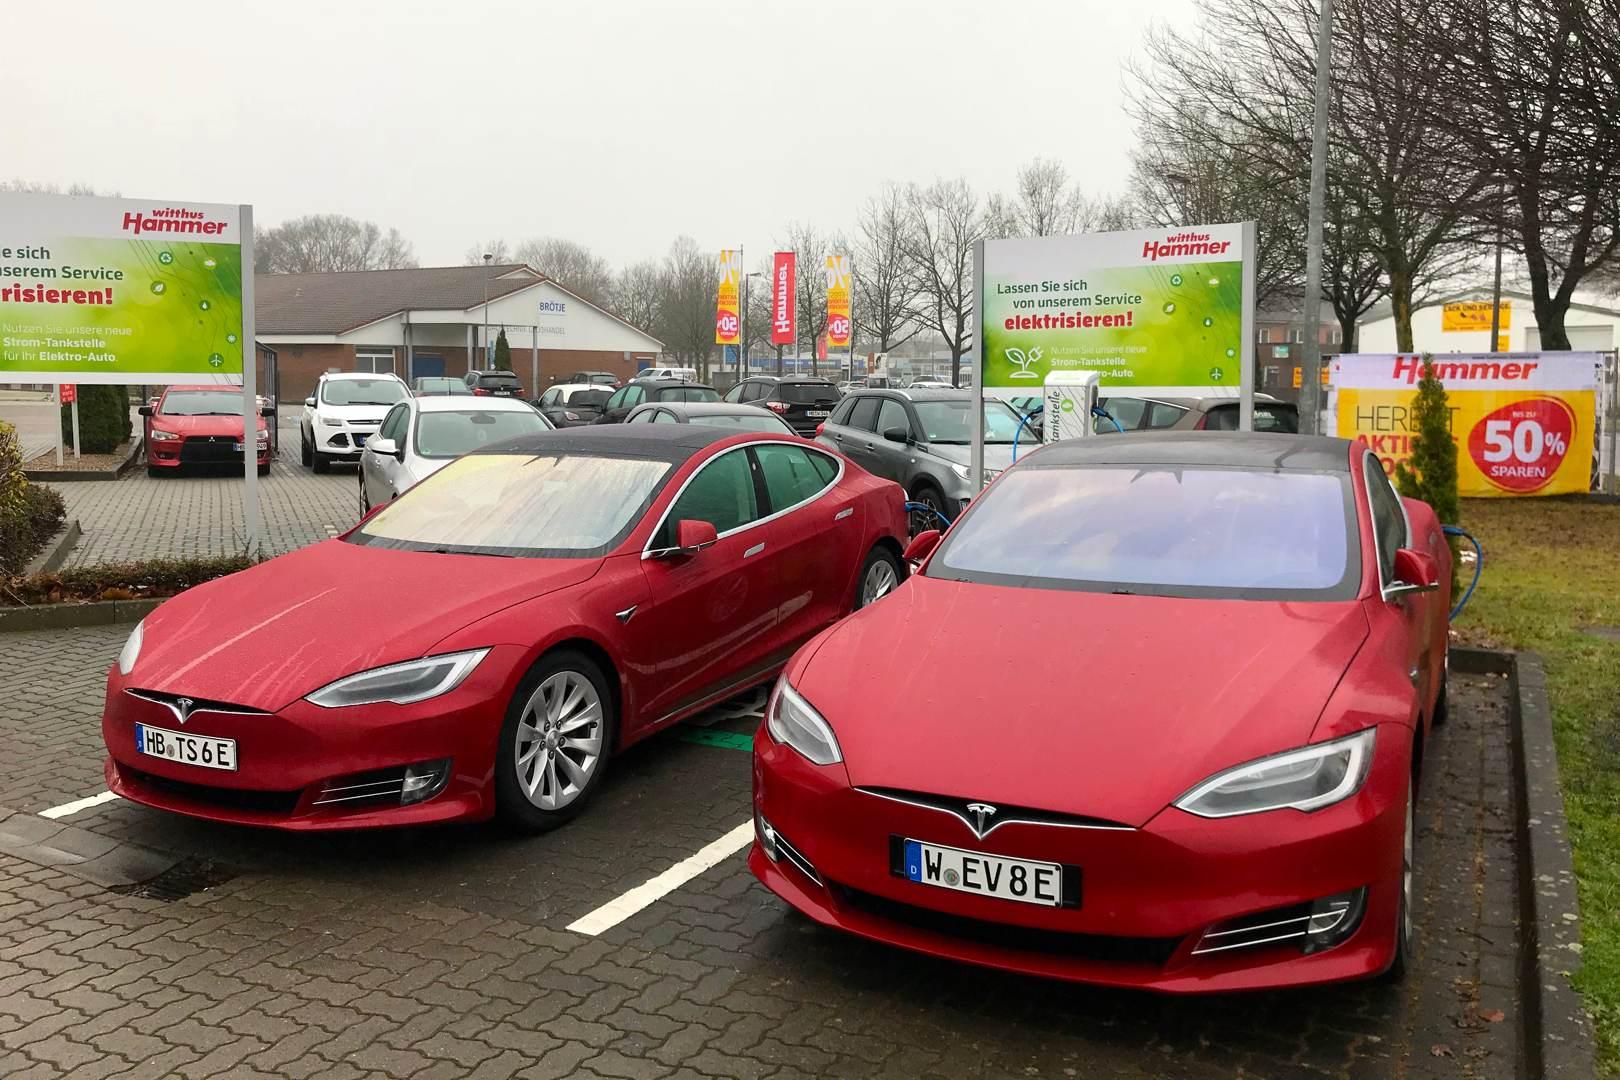 Tesla_Model_S_Neo_Nino_Shorthander_Dennis_Witthus